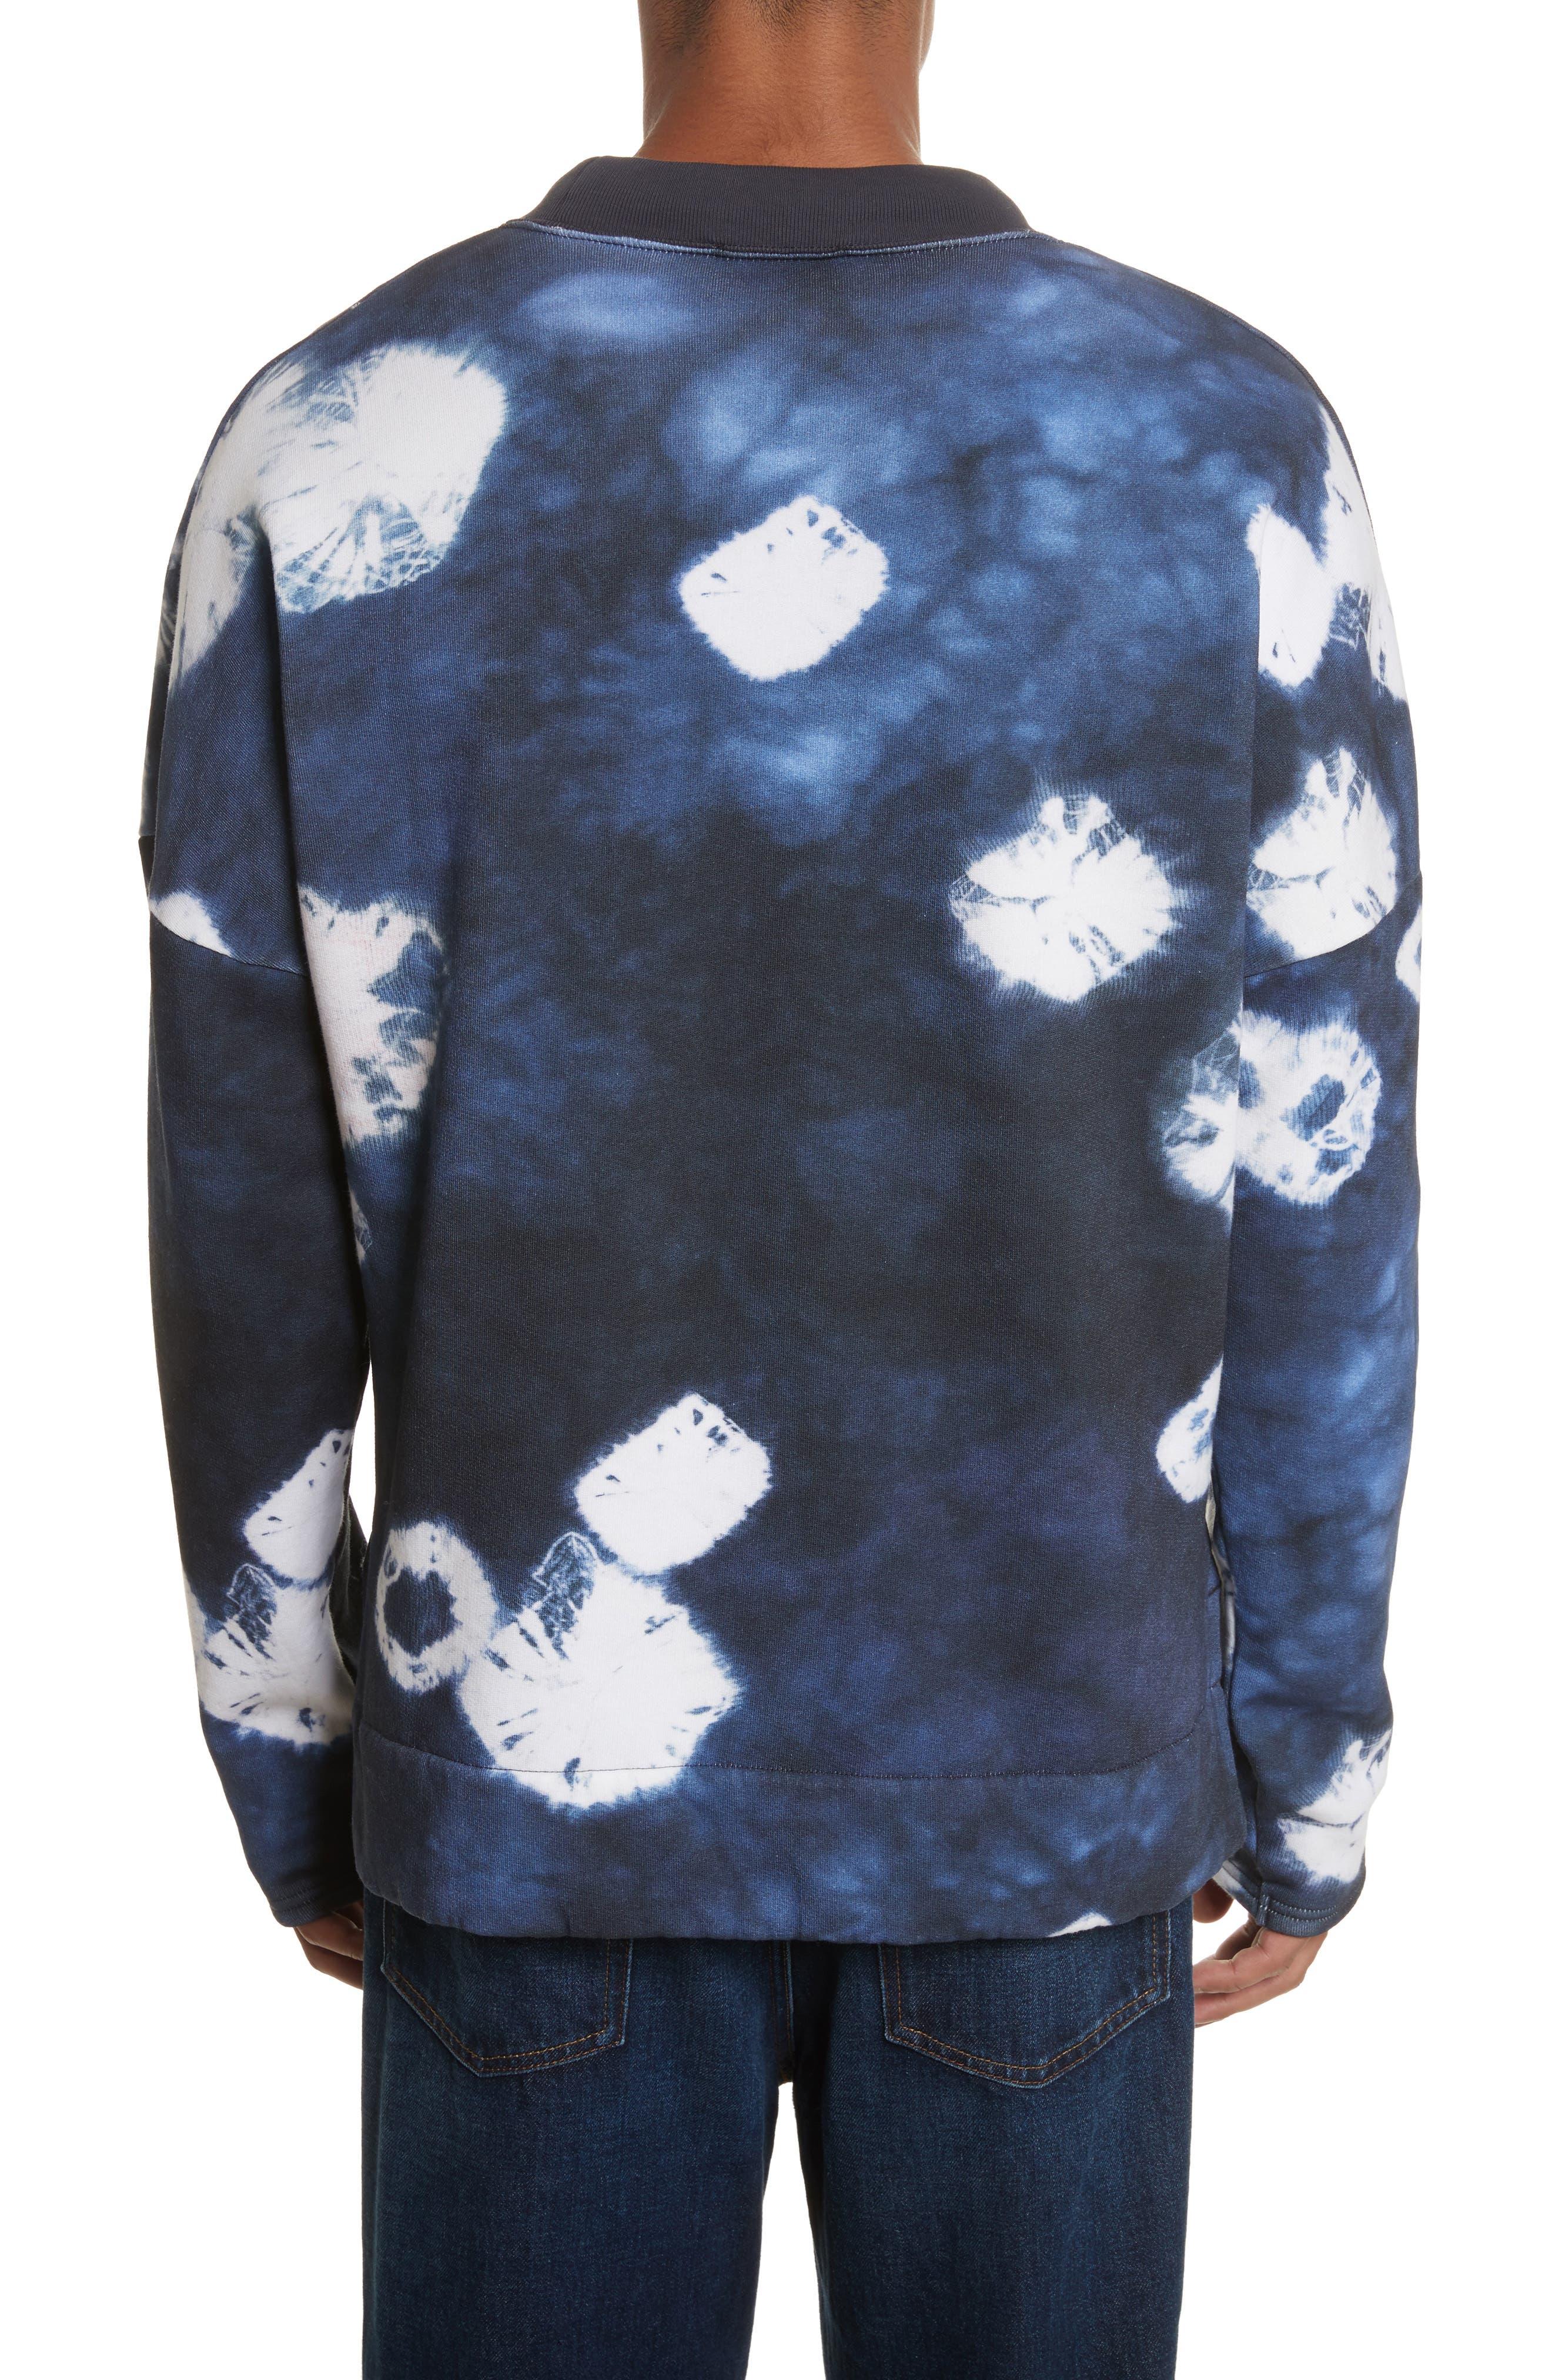 Fellke Bleach Indigo Sweatshirt,                             Alternate thumbnail 2, color,                             410